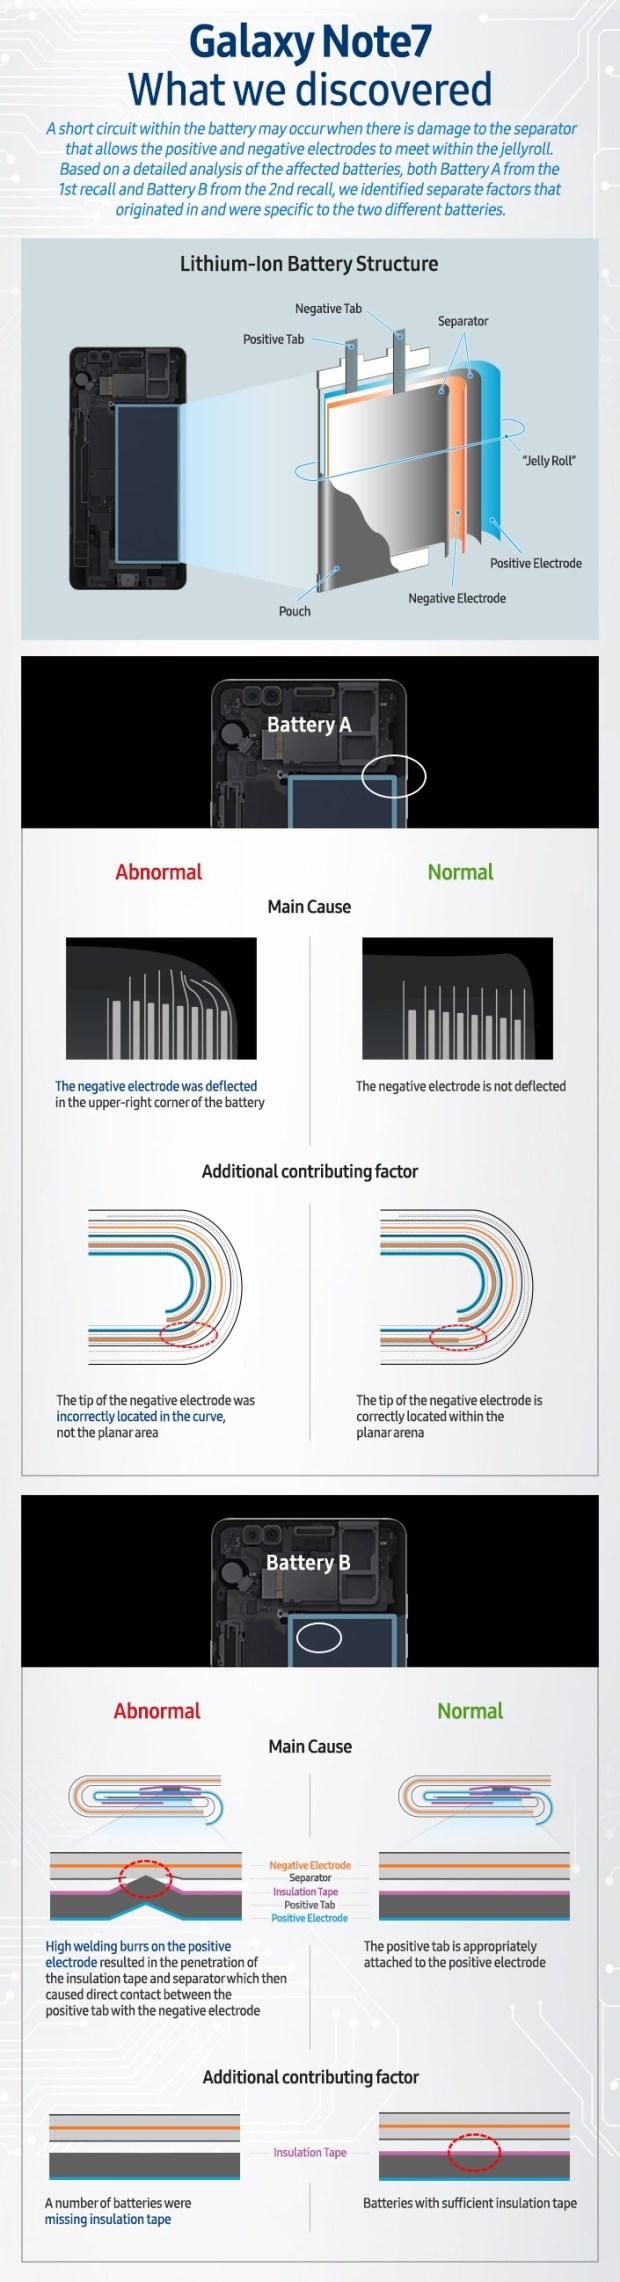 三星公布 Note 7 起火時間調查結果,原因就是它! Infographic-Galaxy-Note7-What-we-discovered